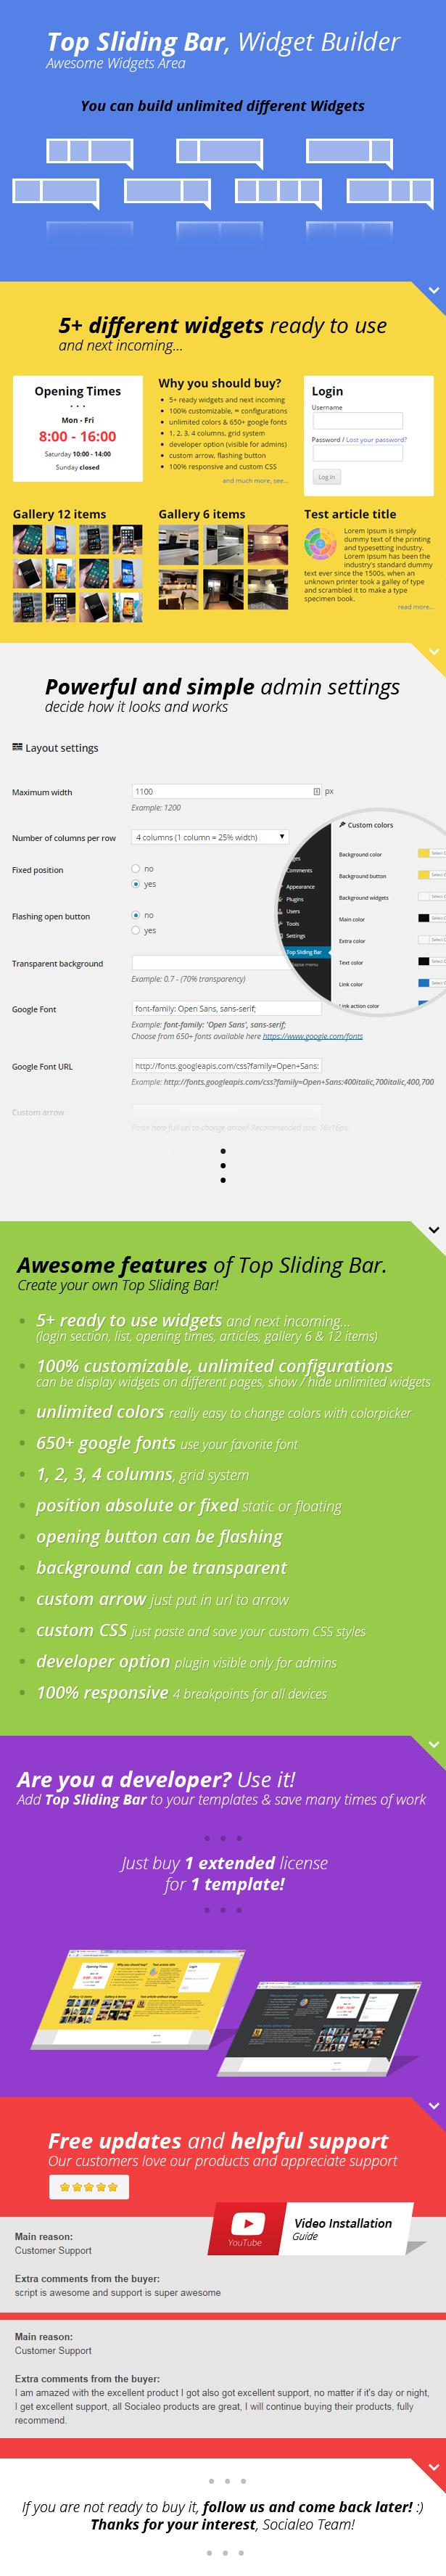 Top Sliding Bar - 2